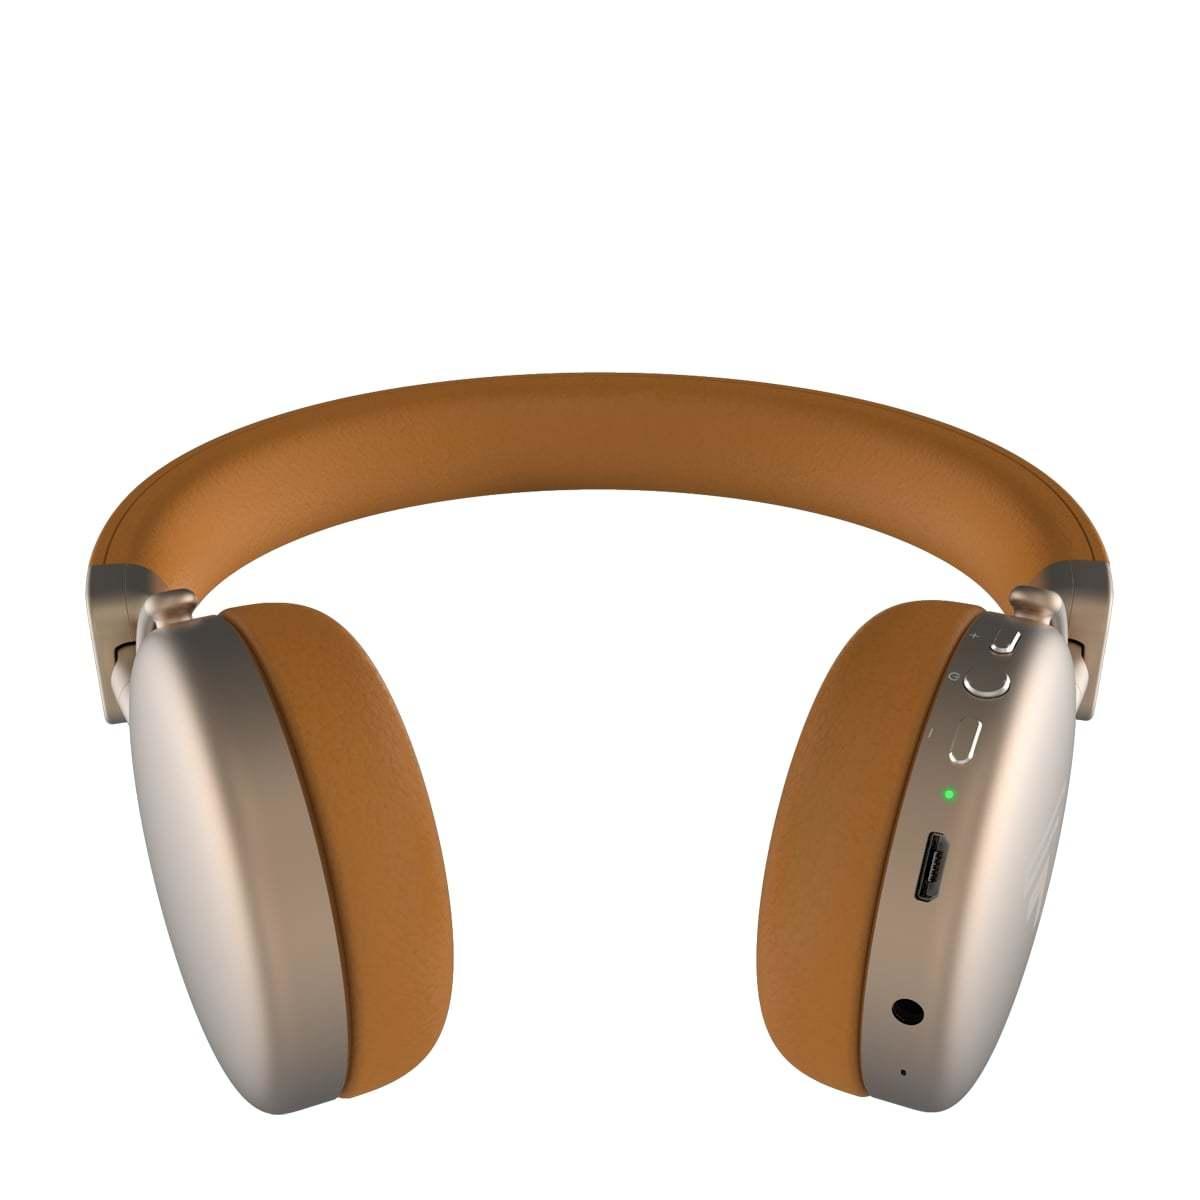 Headset Bluetooth Intelbras Focus Style Gold